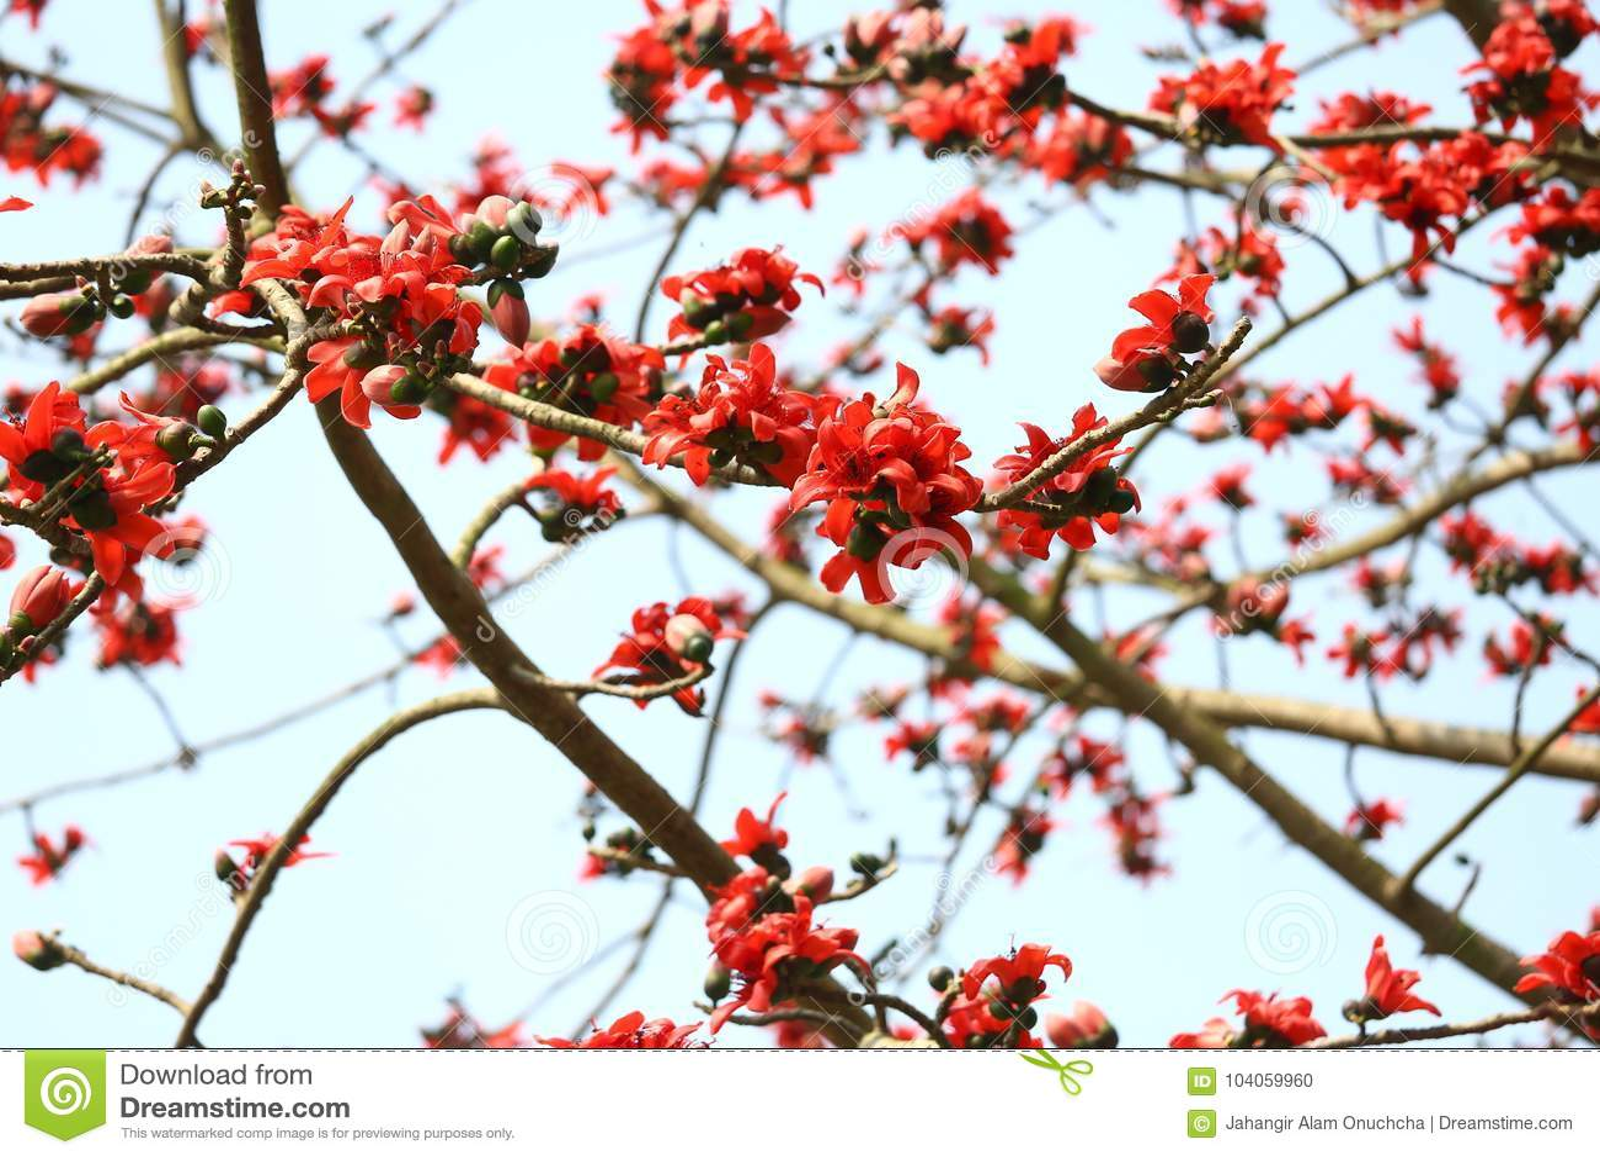 Reddish Shimul Red Silk Cotton Flower Tree At Munshgonj